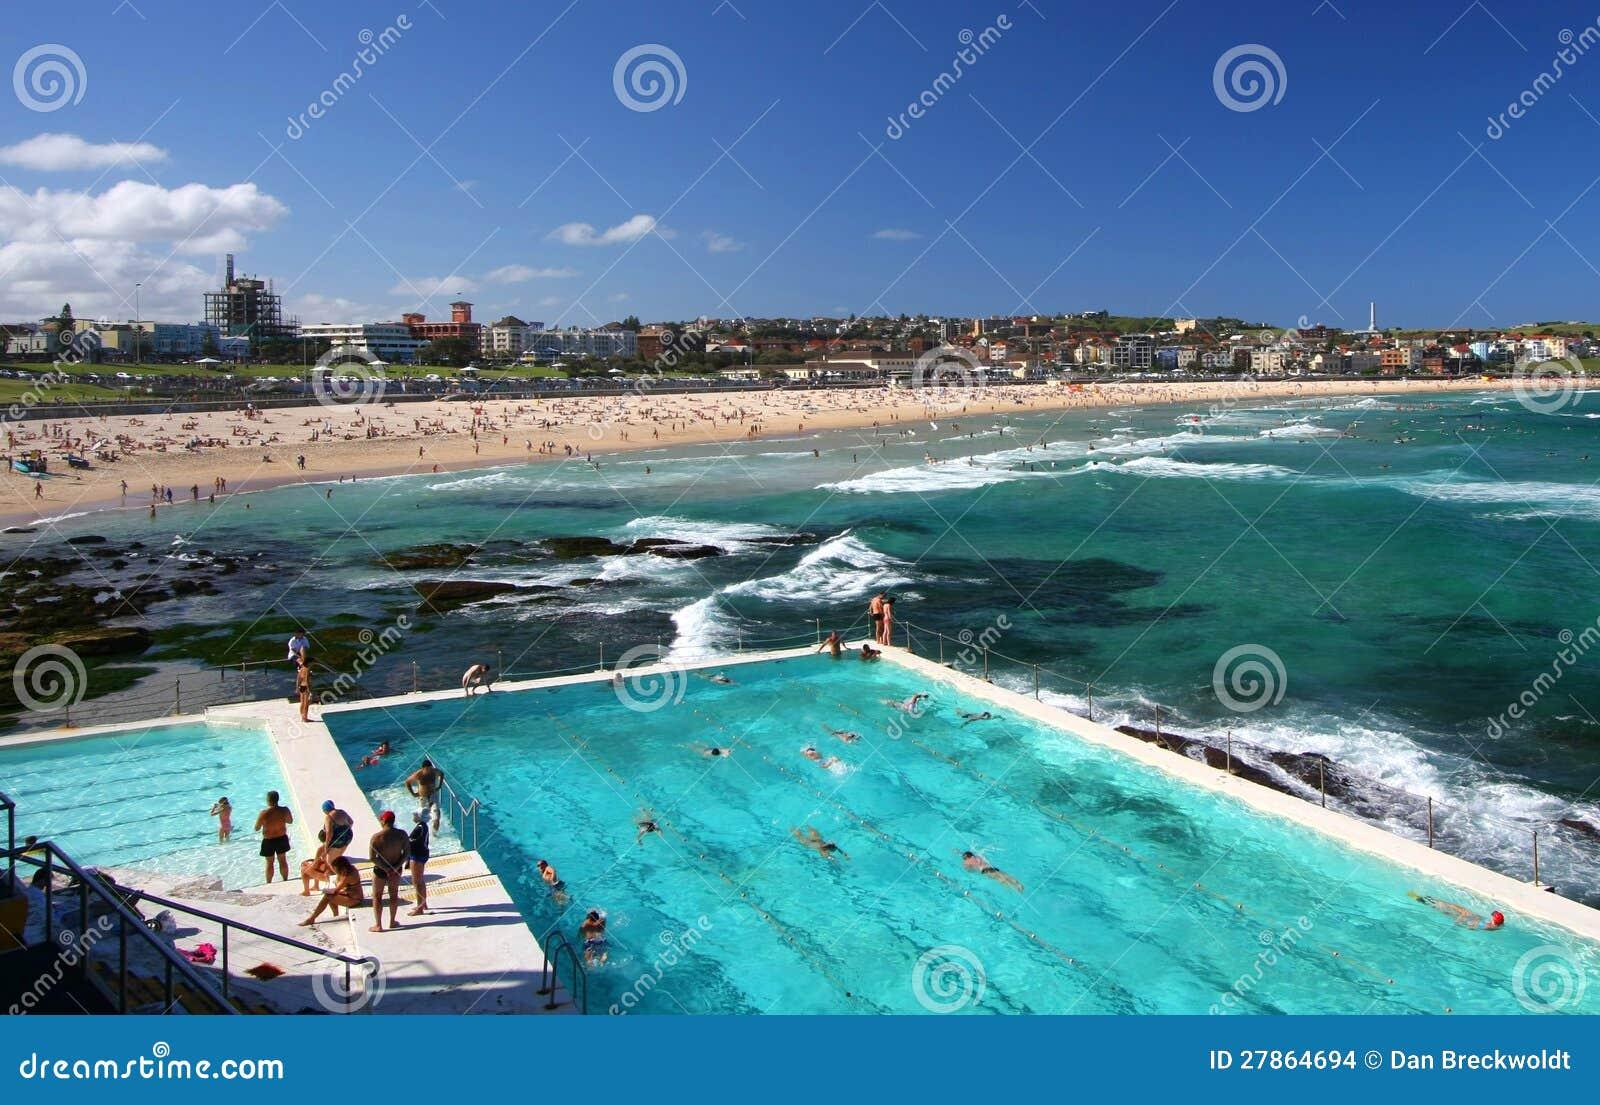 W Sydney Bondi plaża, Australia